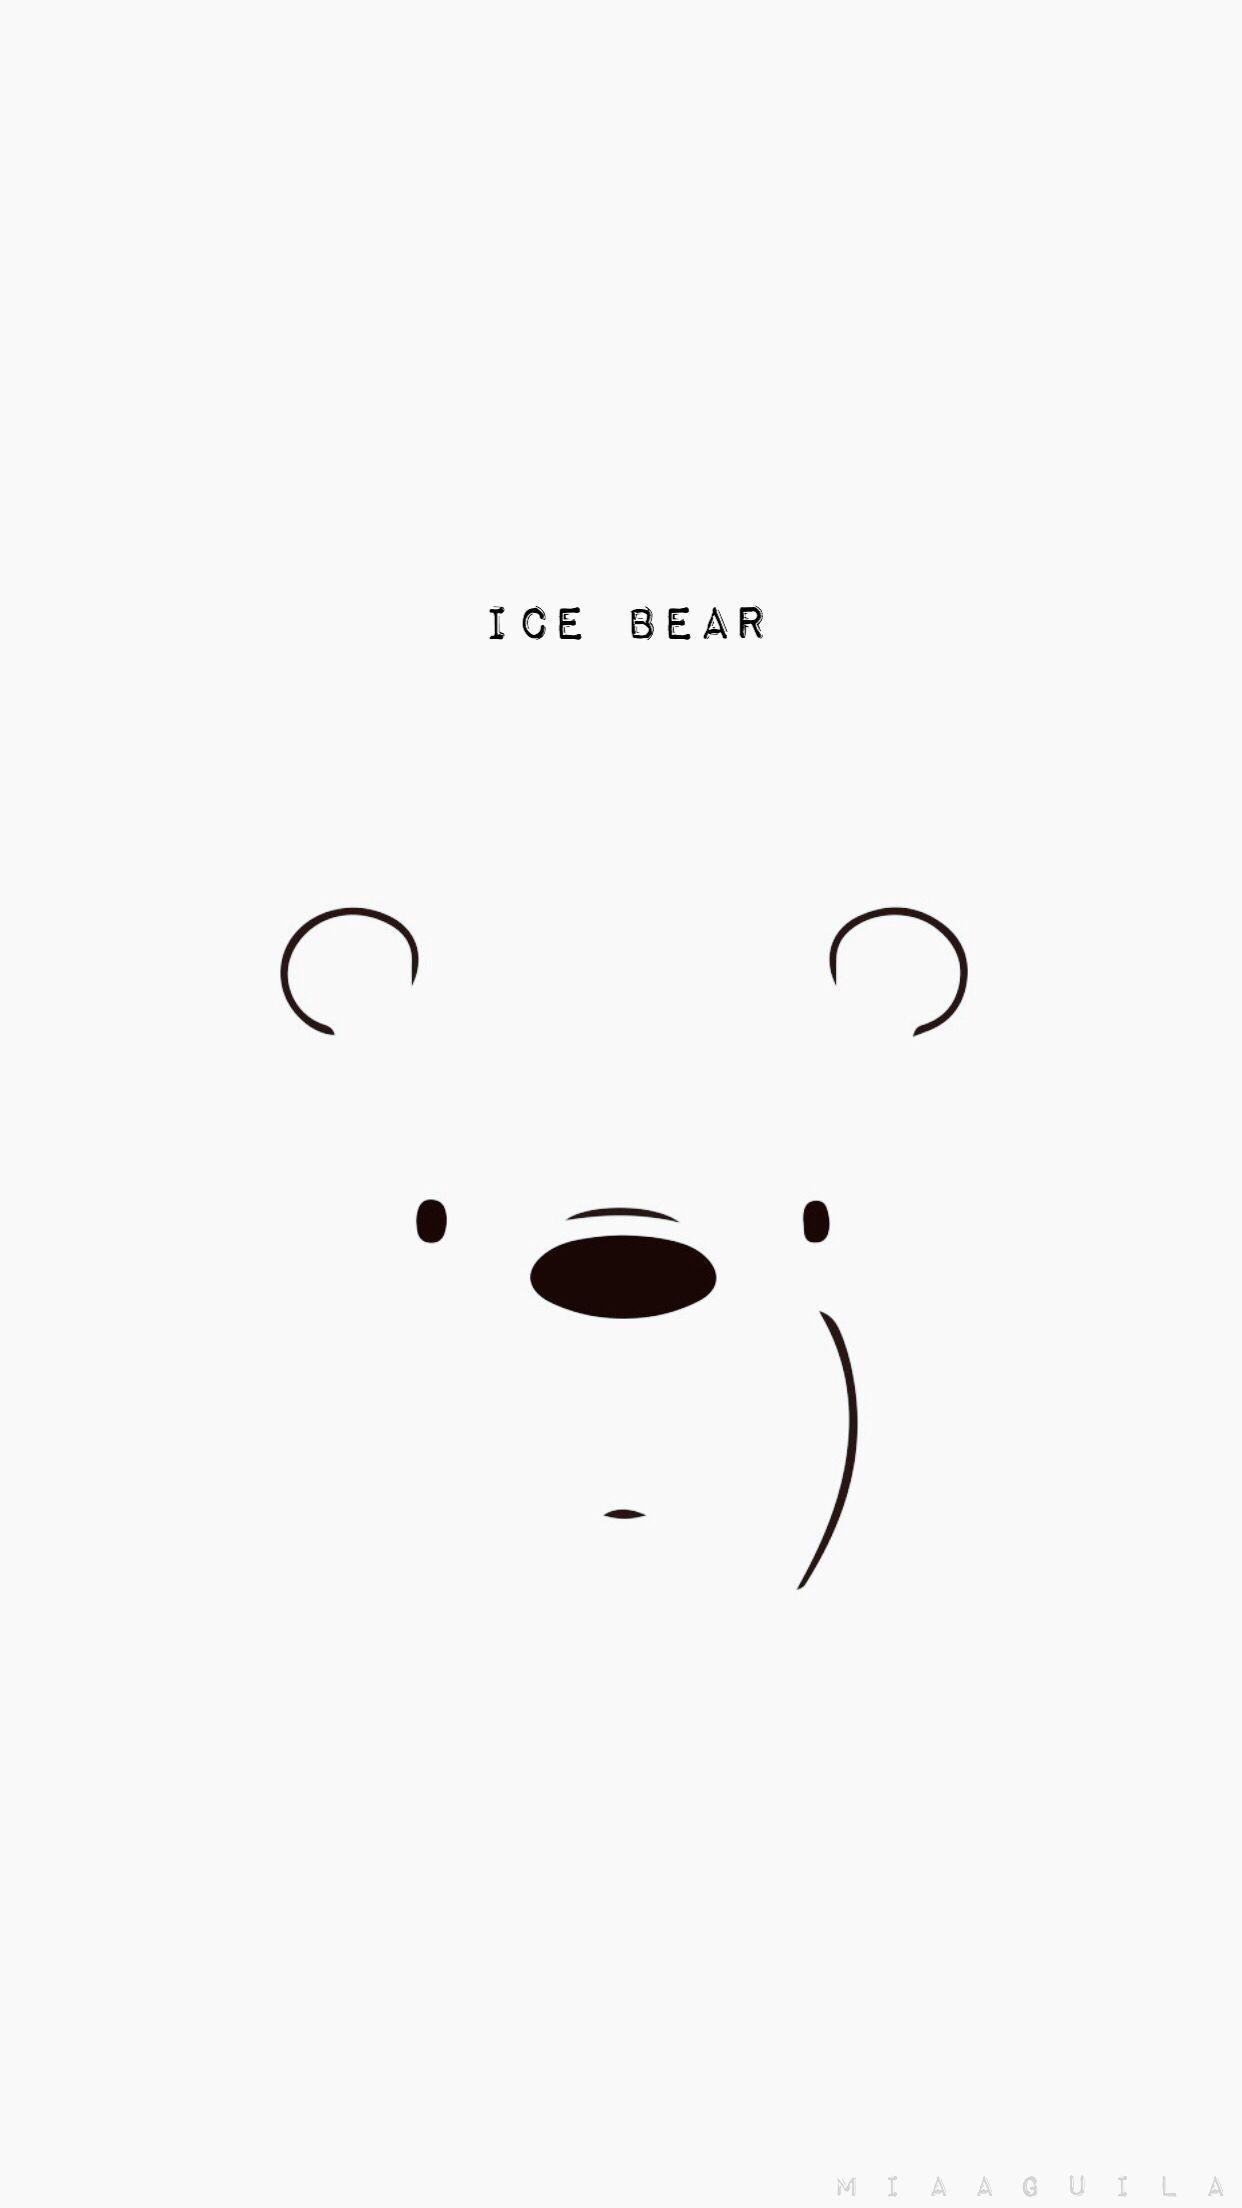 Ozihaki Wallpaper Hd New Panda We Bare Bears Wallpaper Black Background We Bare Bears Wallpapers Ice Bear We Bare Bears Bear Wallpaper